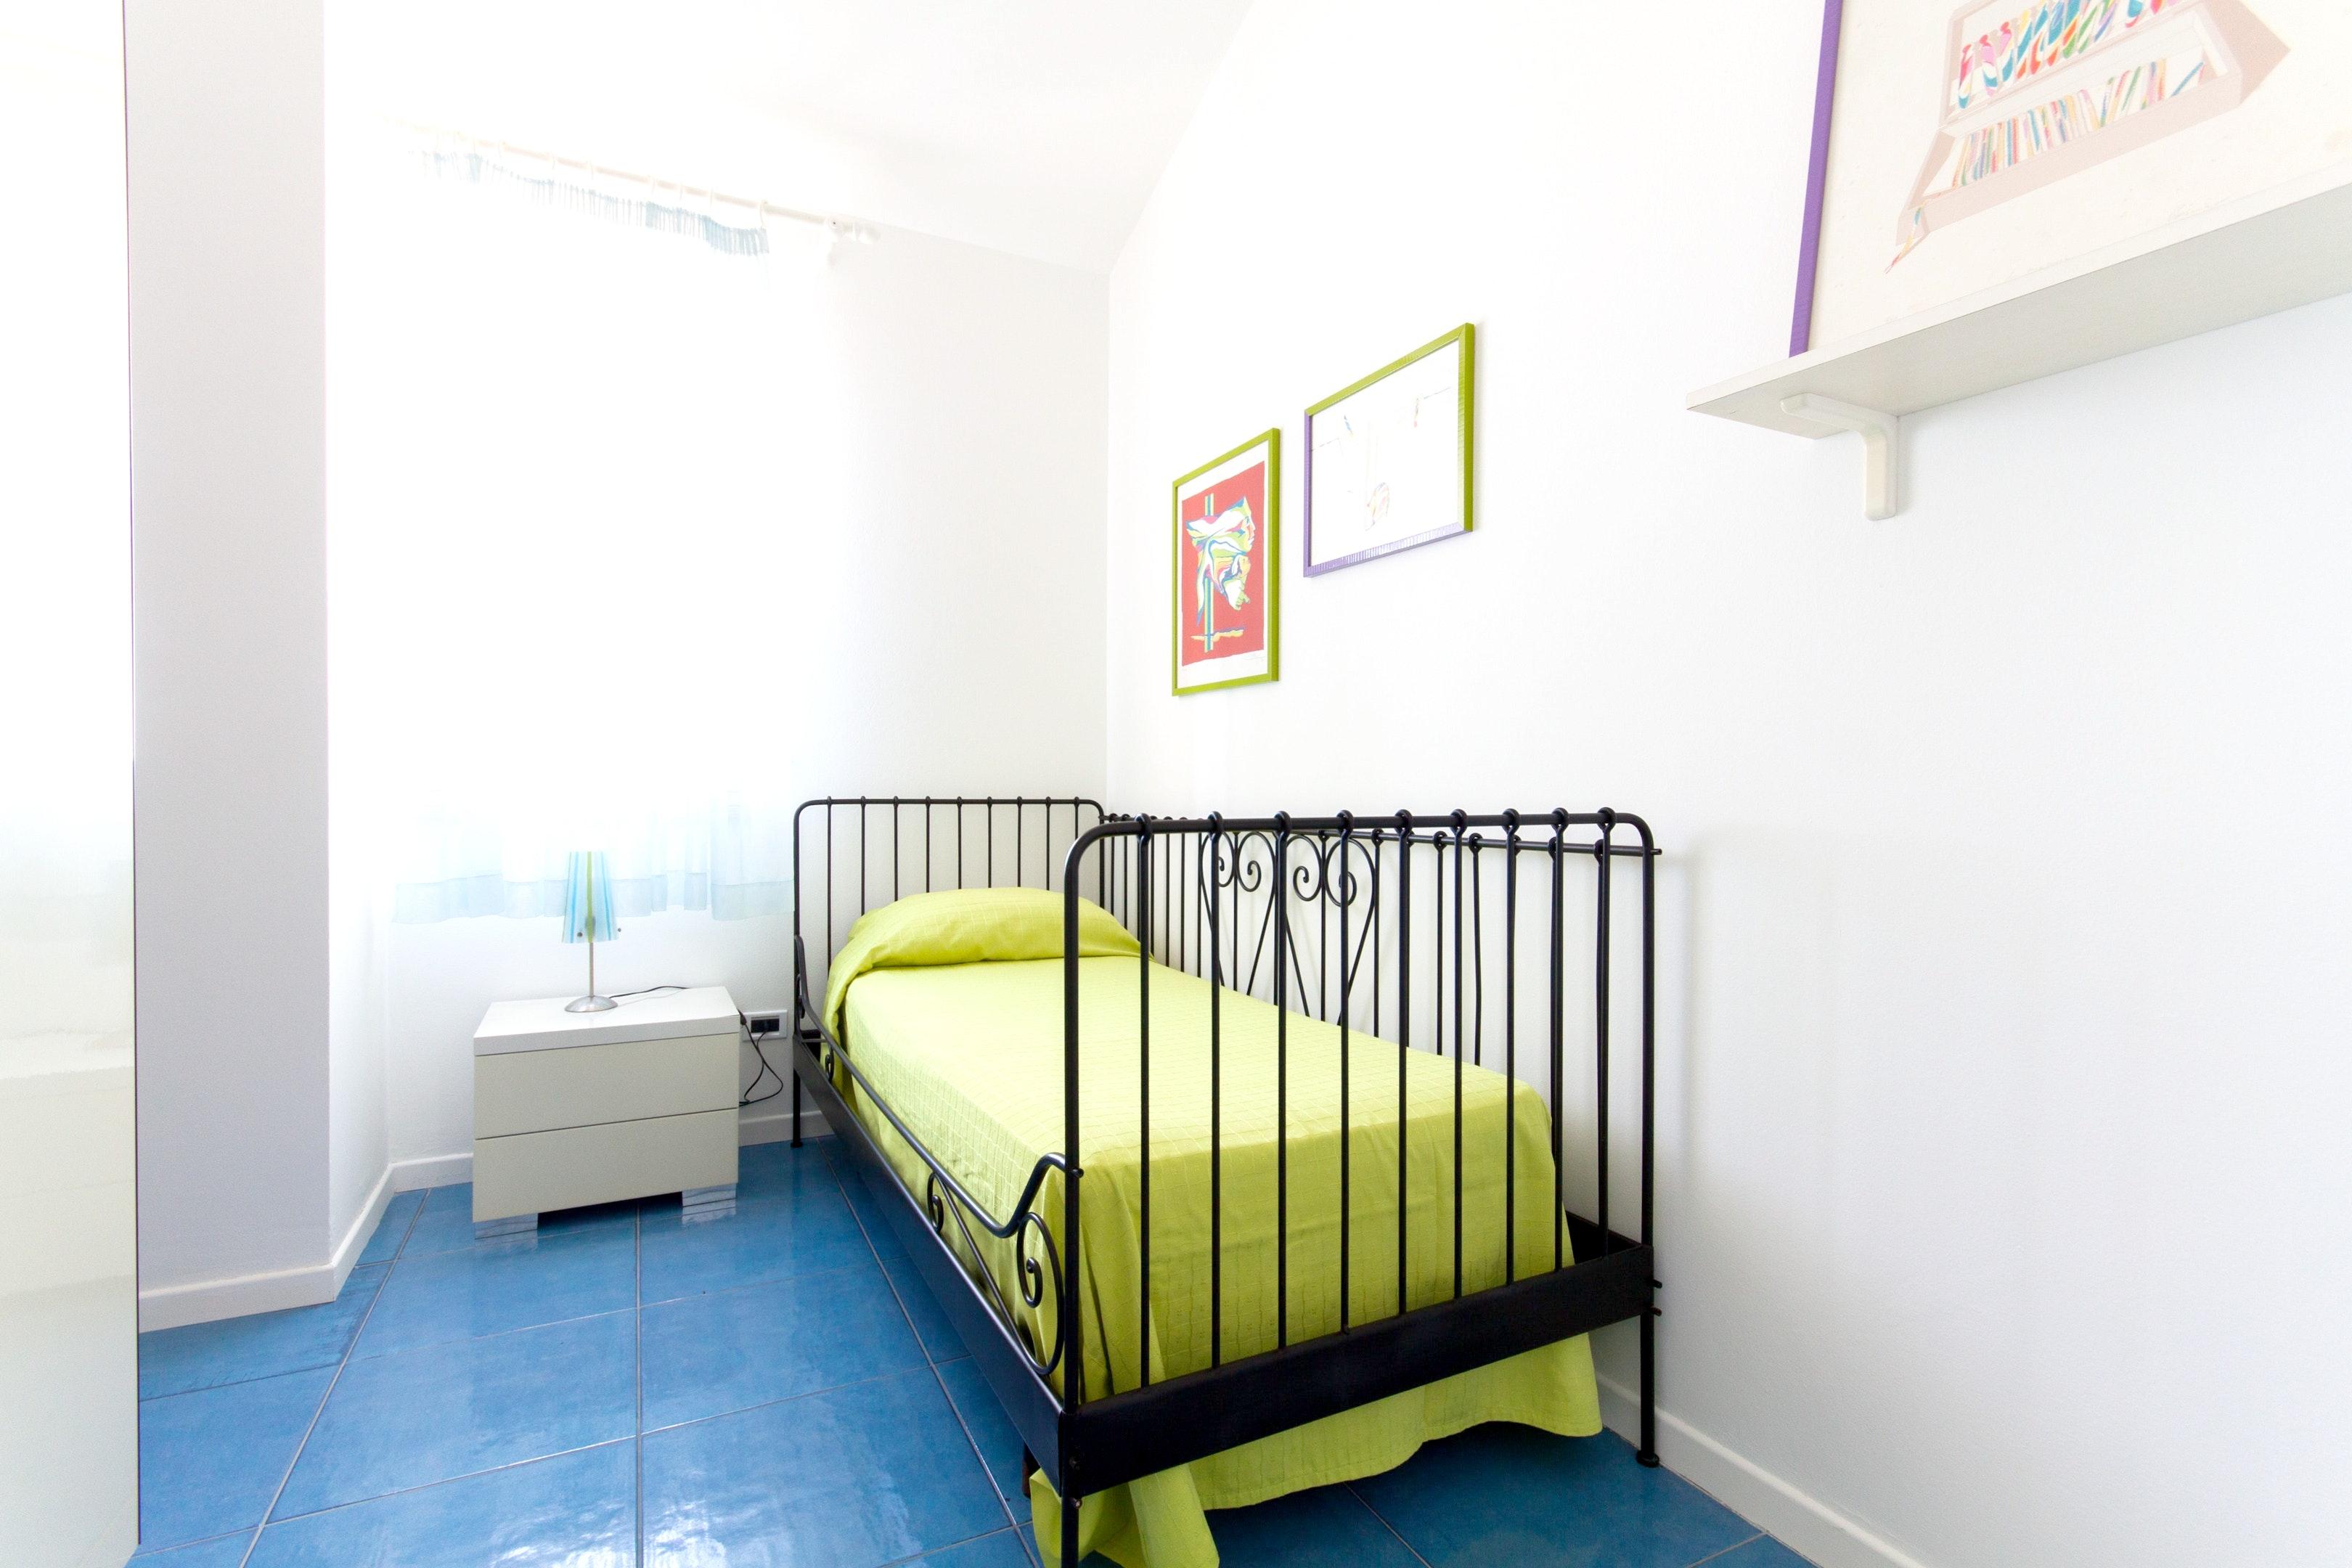 Holiday apartment Wohnung mit 4 Schlafzimmern in Piano di Trappeto mit herrlichem Meerblick, möblierter Terr (2236750), Balestrate, Palermo, Sicily, Italy, picture 16